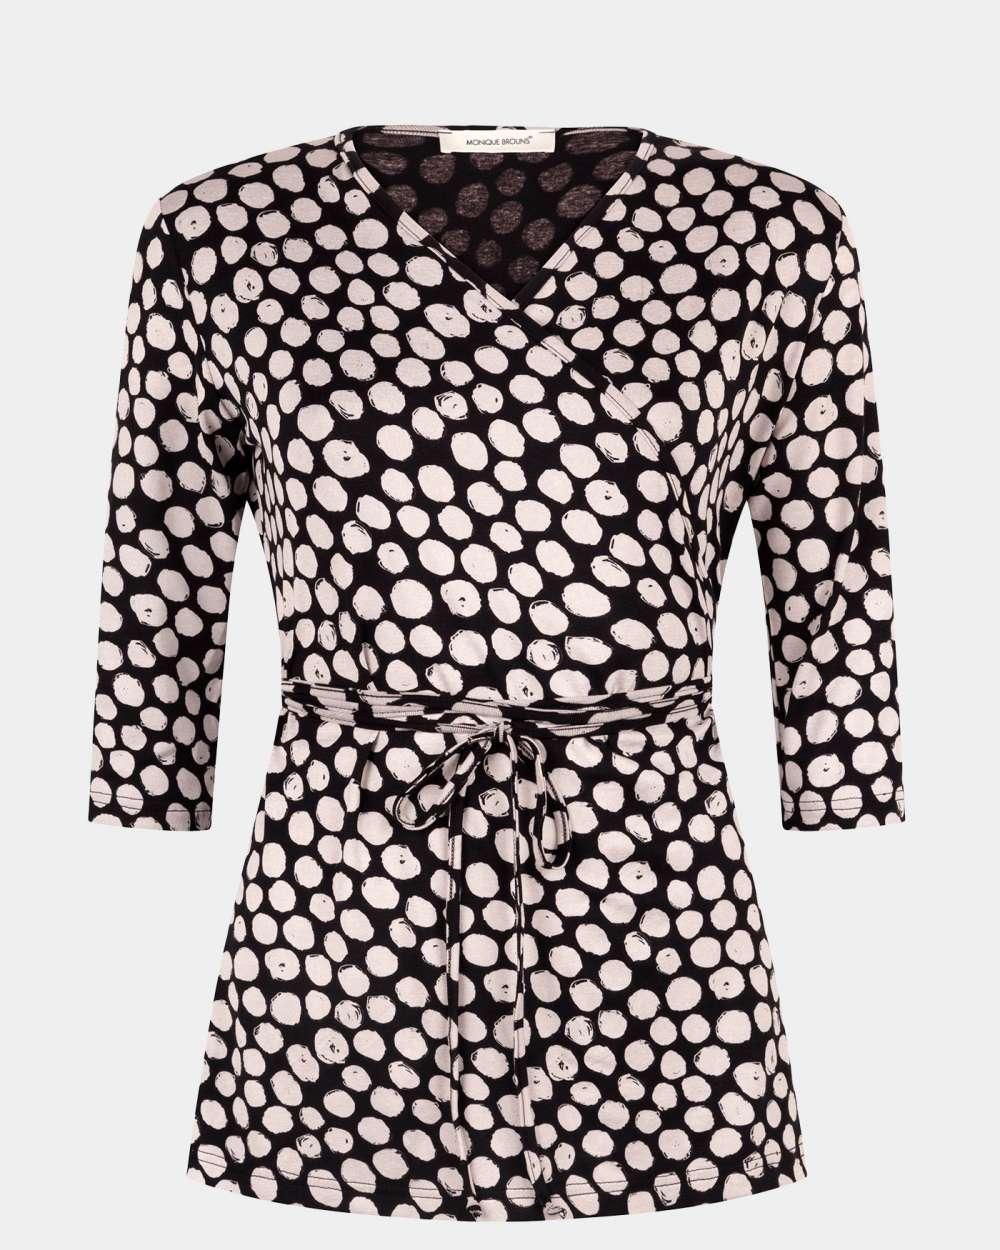 black & off white wrap top